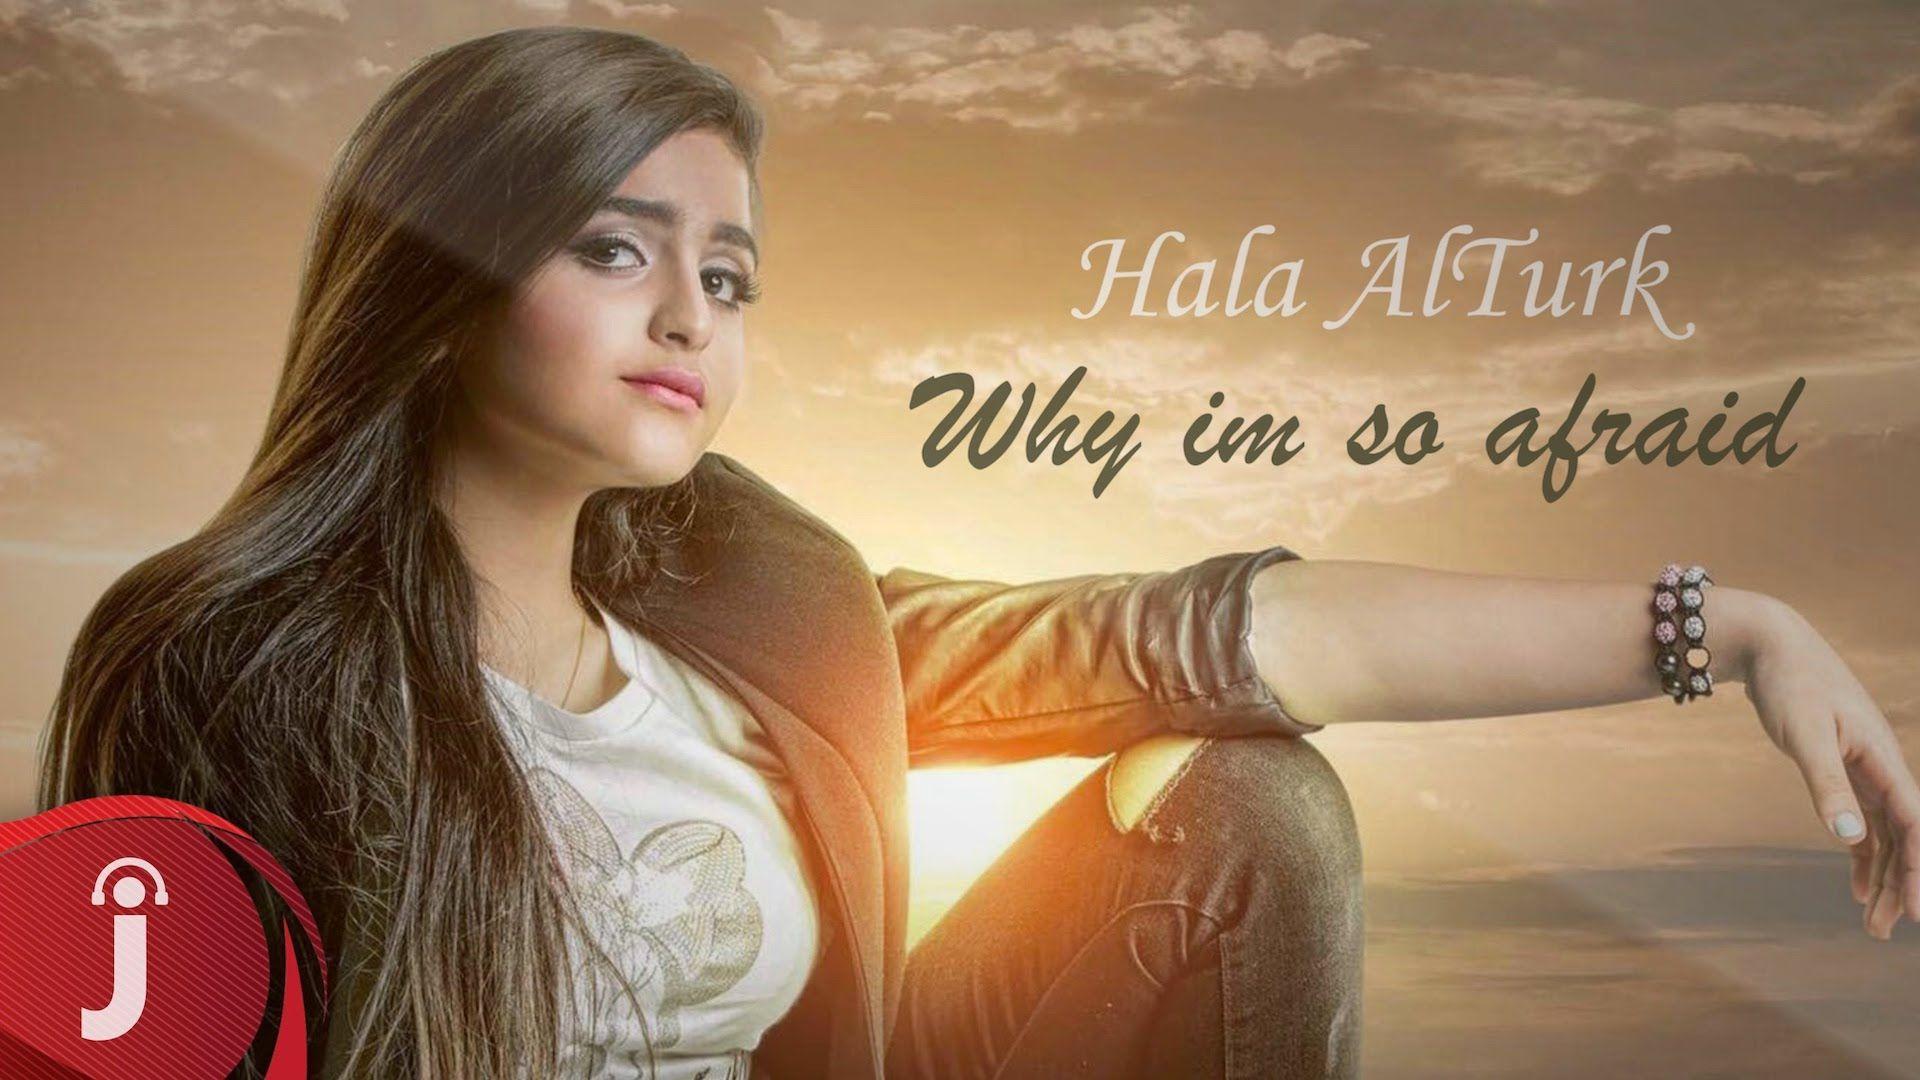 Hala Al Turk Wallpapers Hd Why I M So Afraid Exclusive Video Clip Hala Alturk